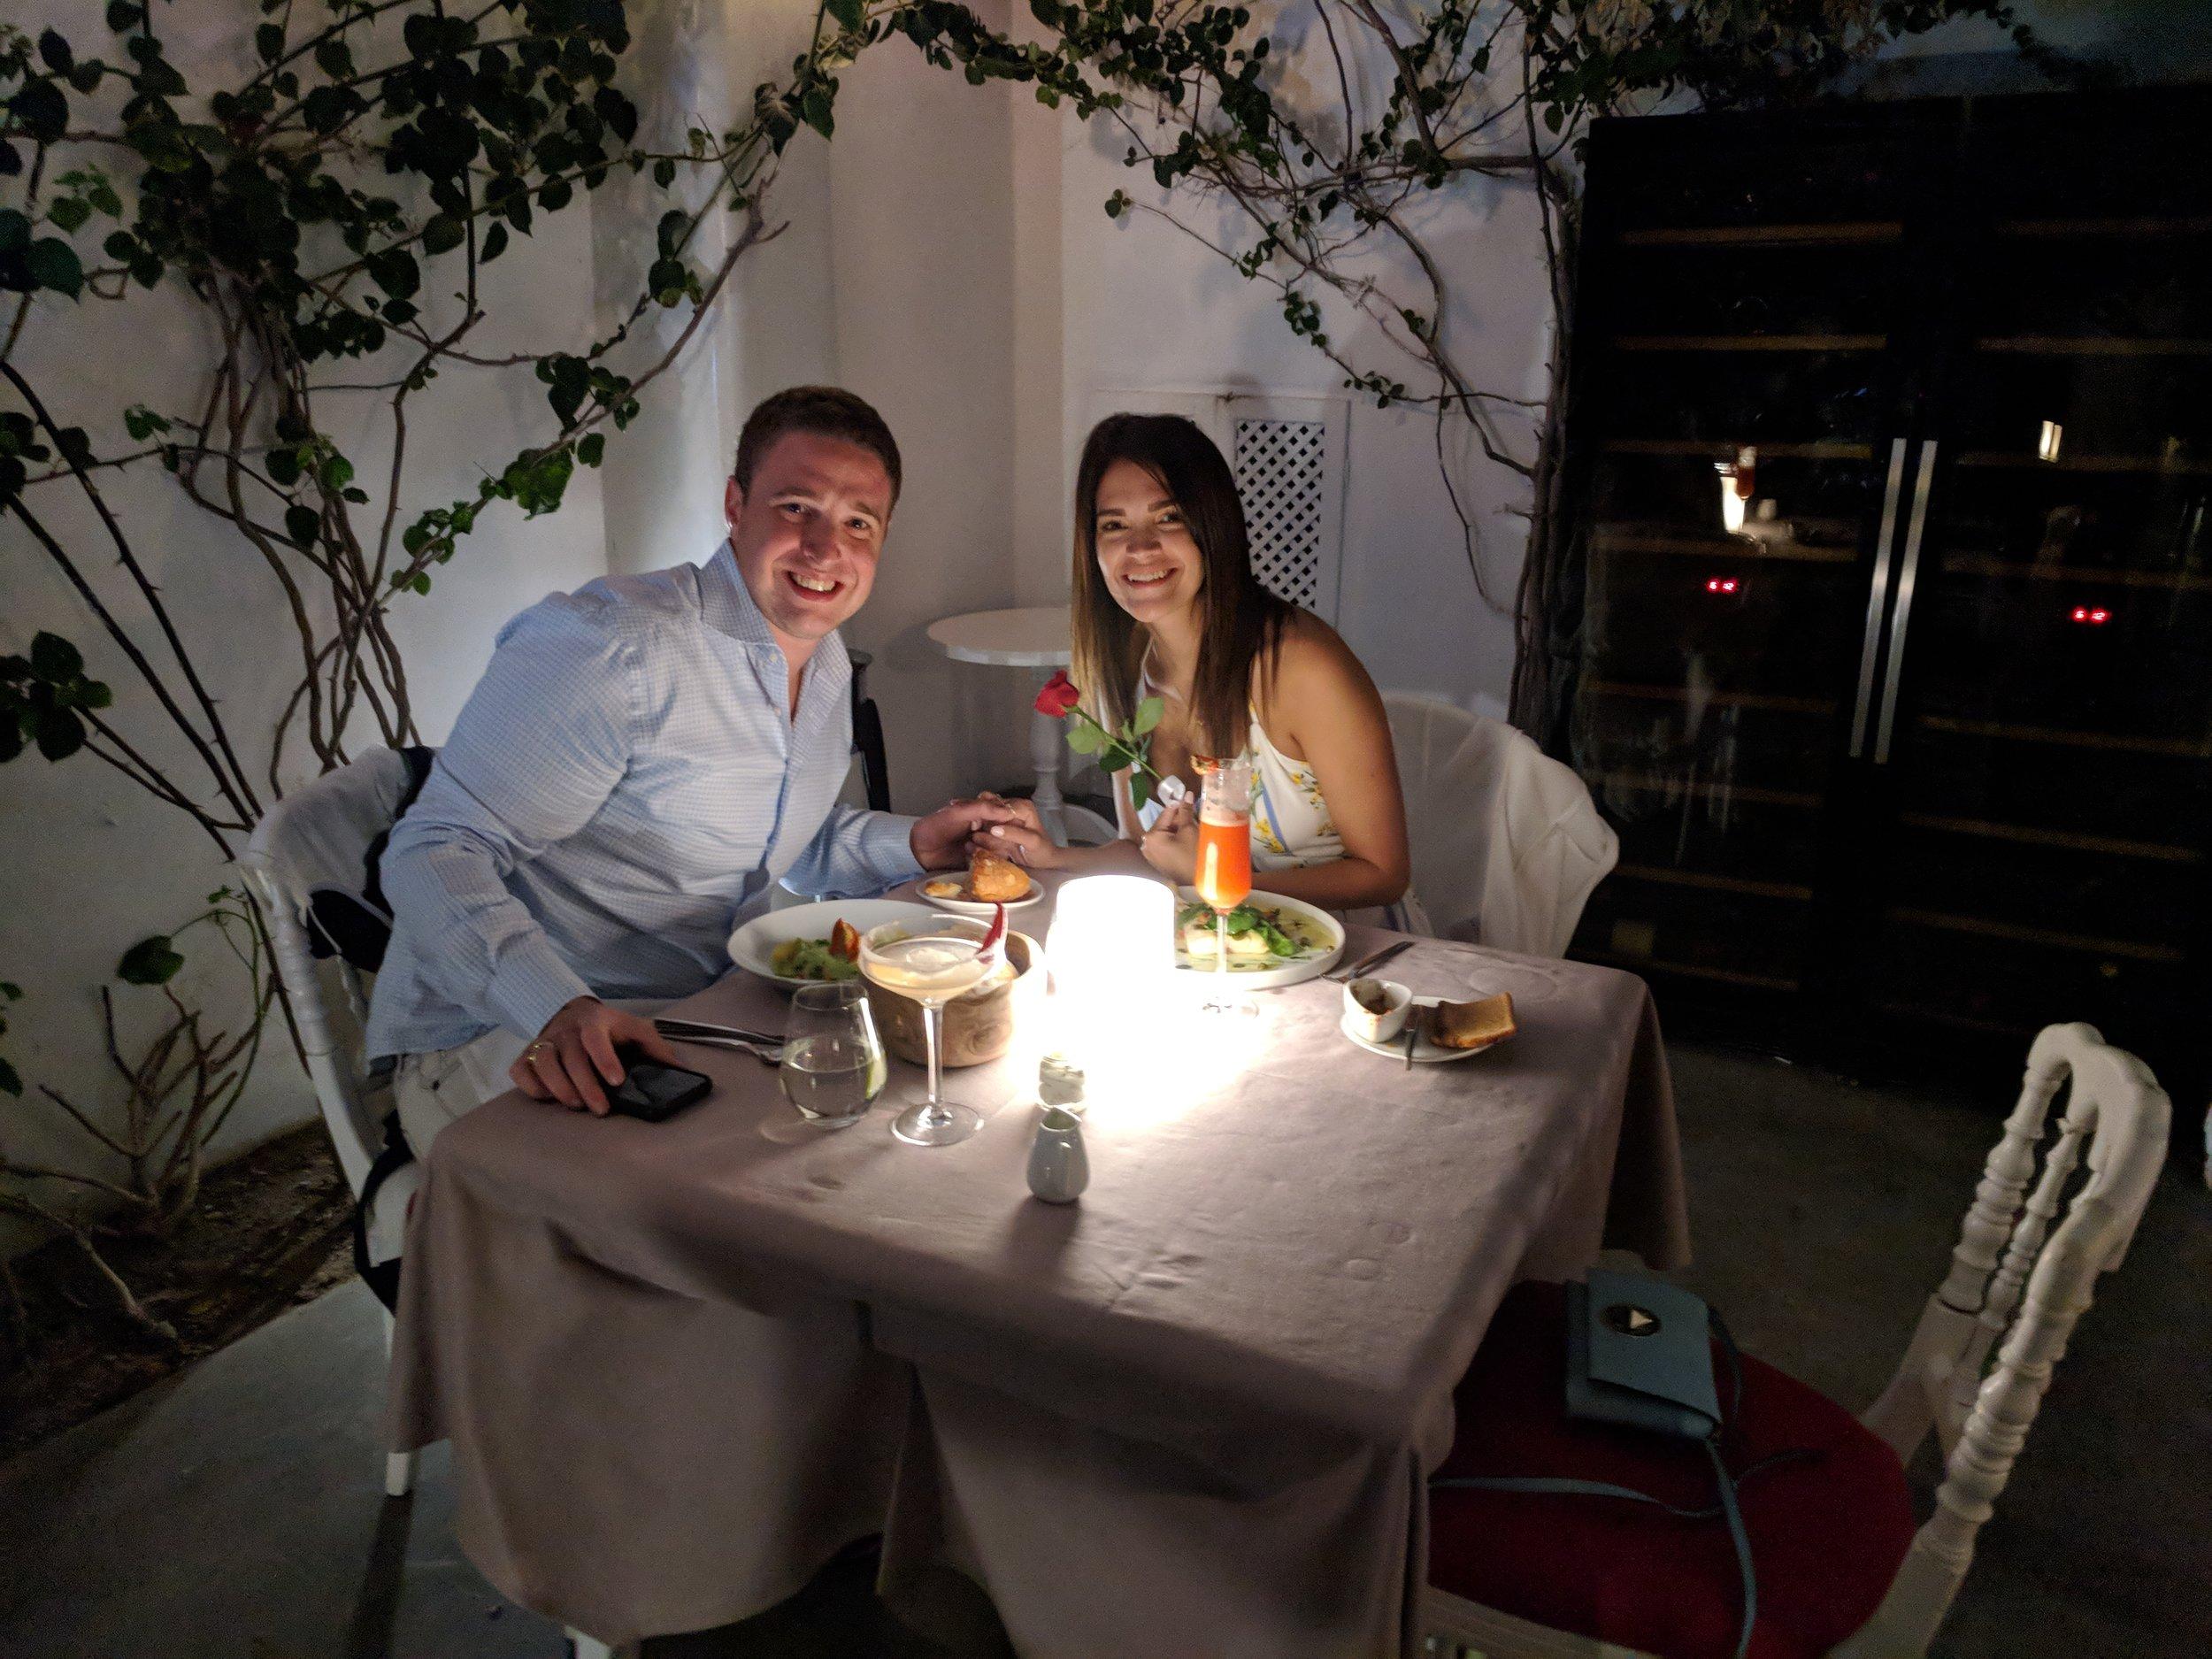 Robert and Princess Kerins in Santorini, Greece